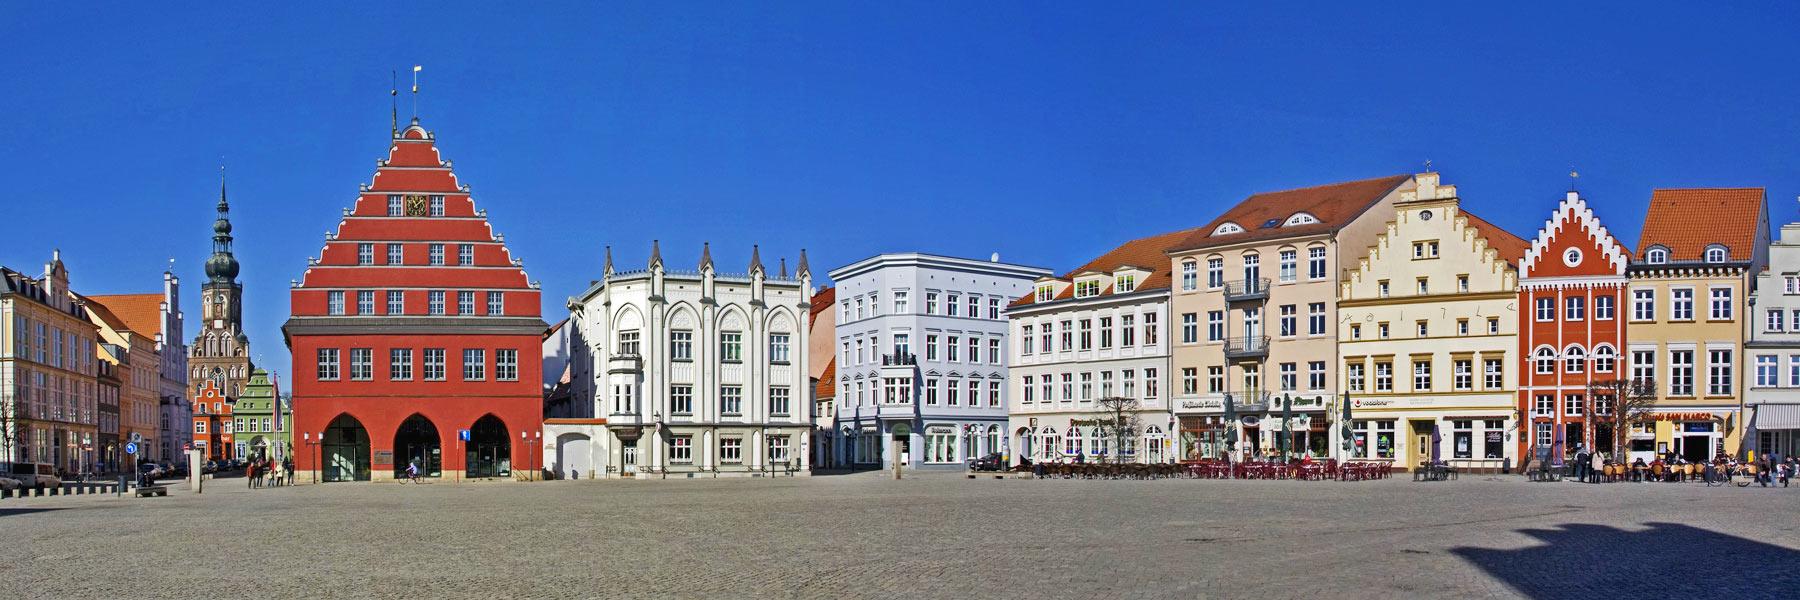 Marktplatz Rathaus - Hansestadt Greifswald